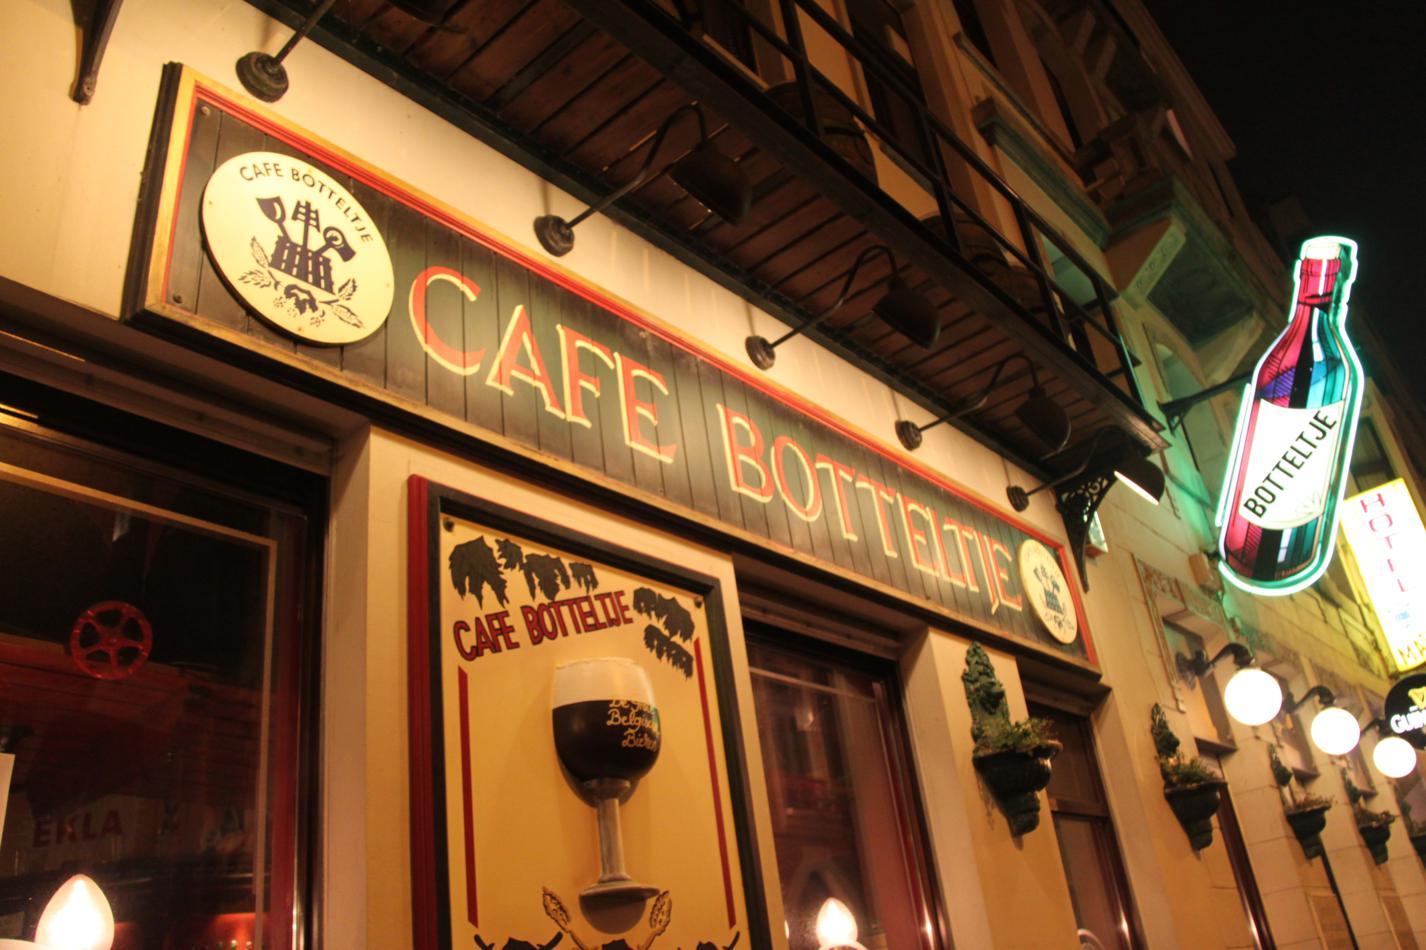 Cafe Botteltje